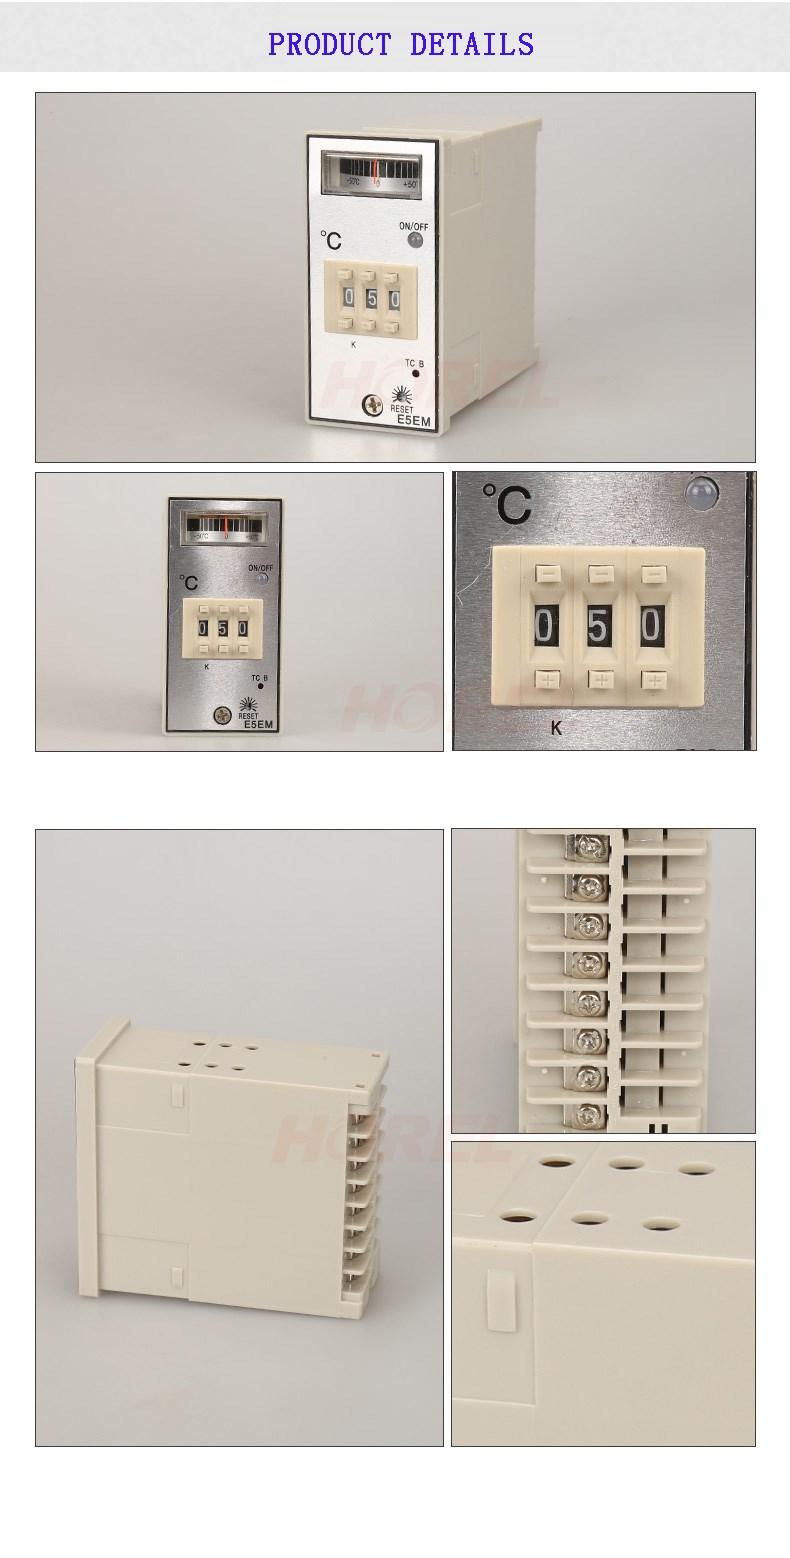 E5EM Temperature controller 4.jpg